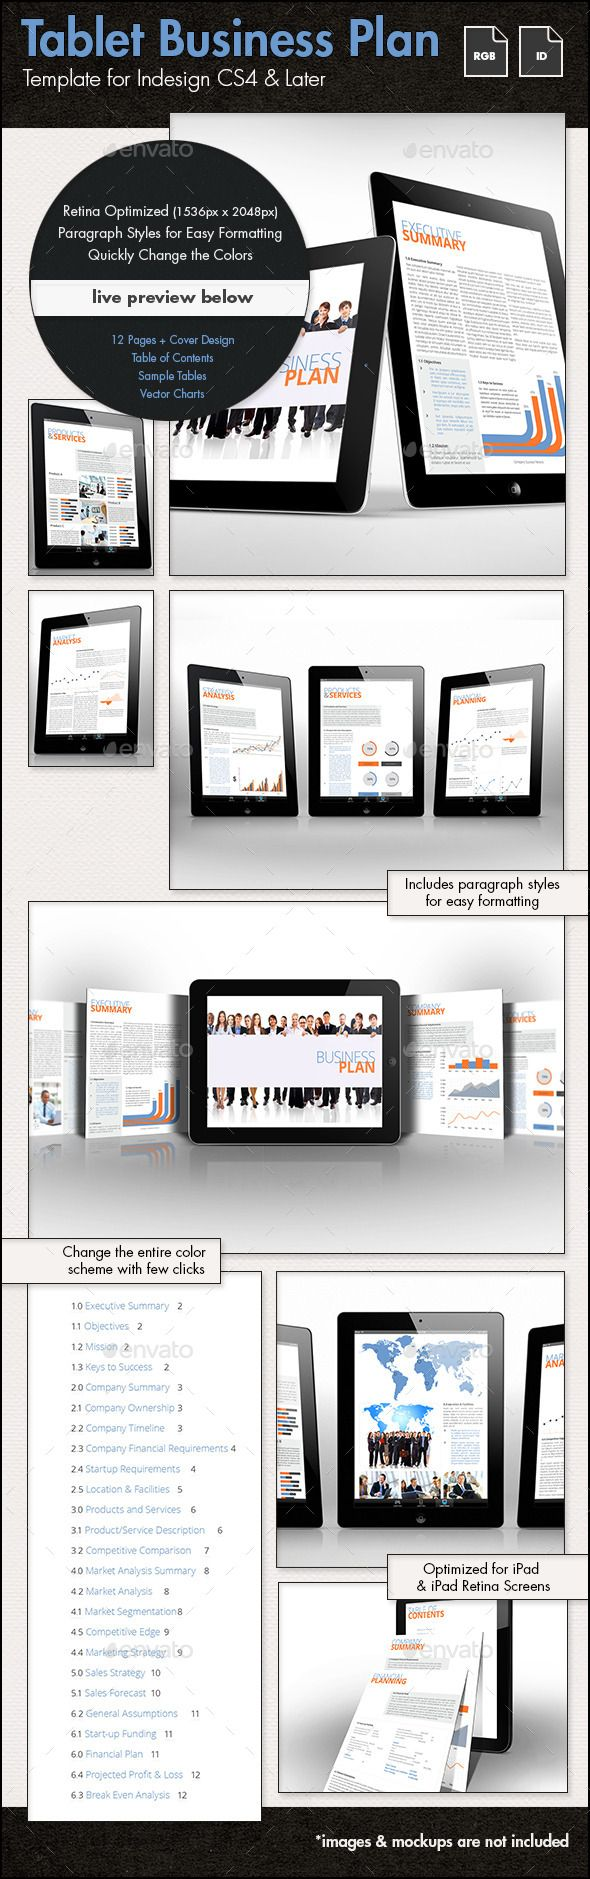 The Best Business Plan Presentation Ideas On Pinterest - Business plan template design